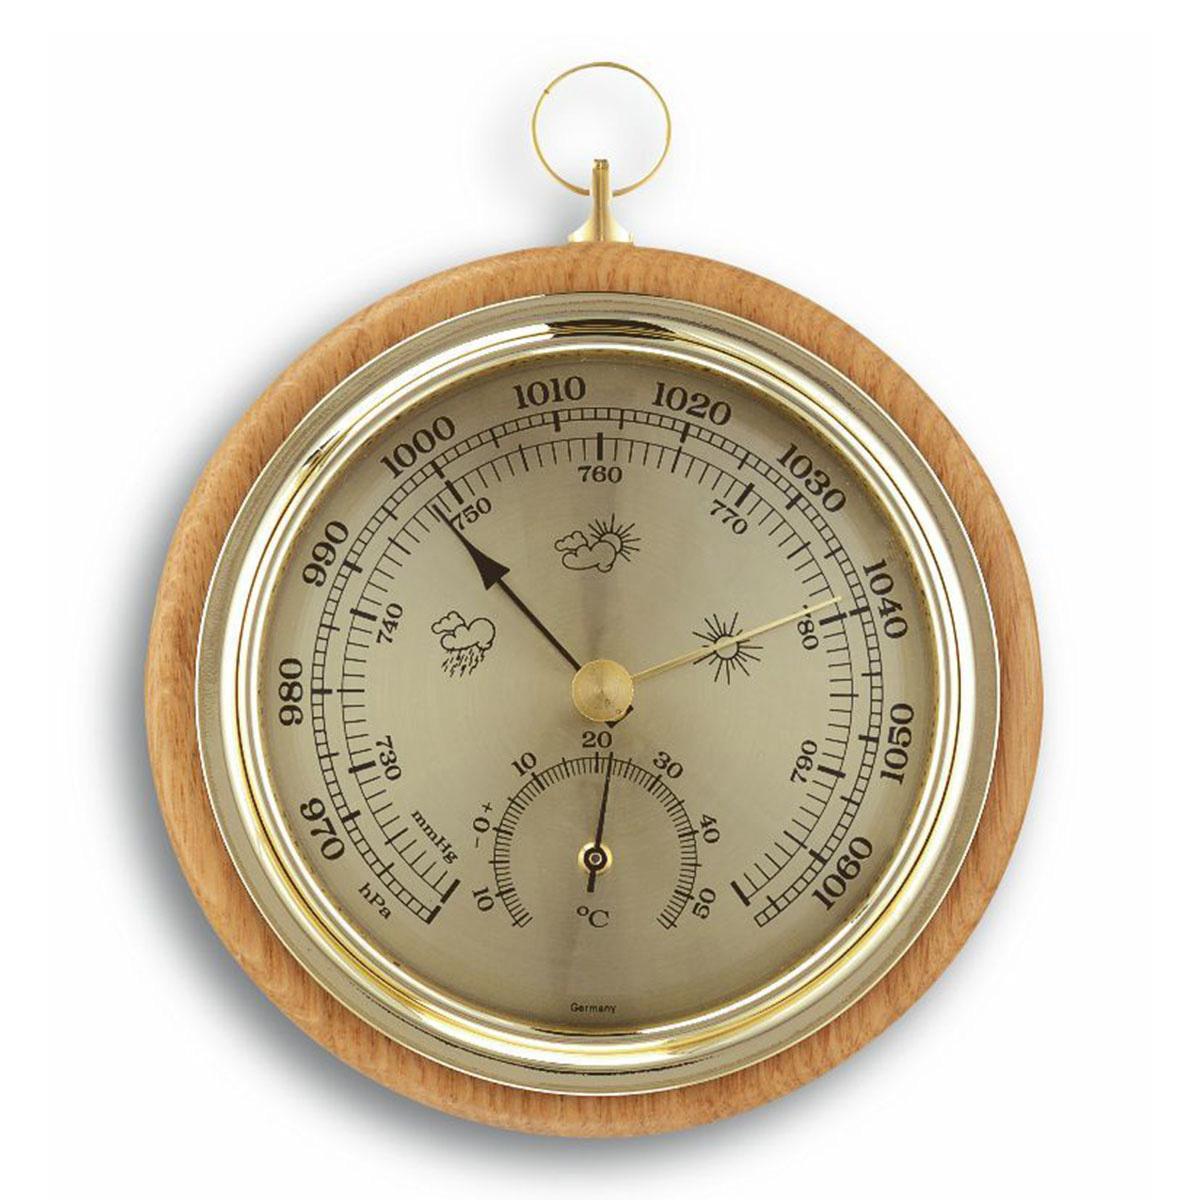 45-1000-05-analoges-thermo-barometer-massivholz-1200x1200px.jpg